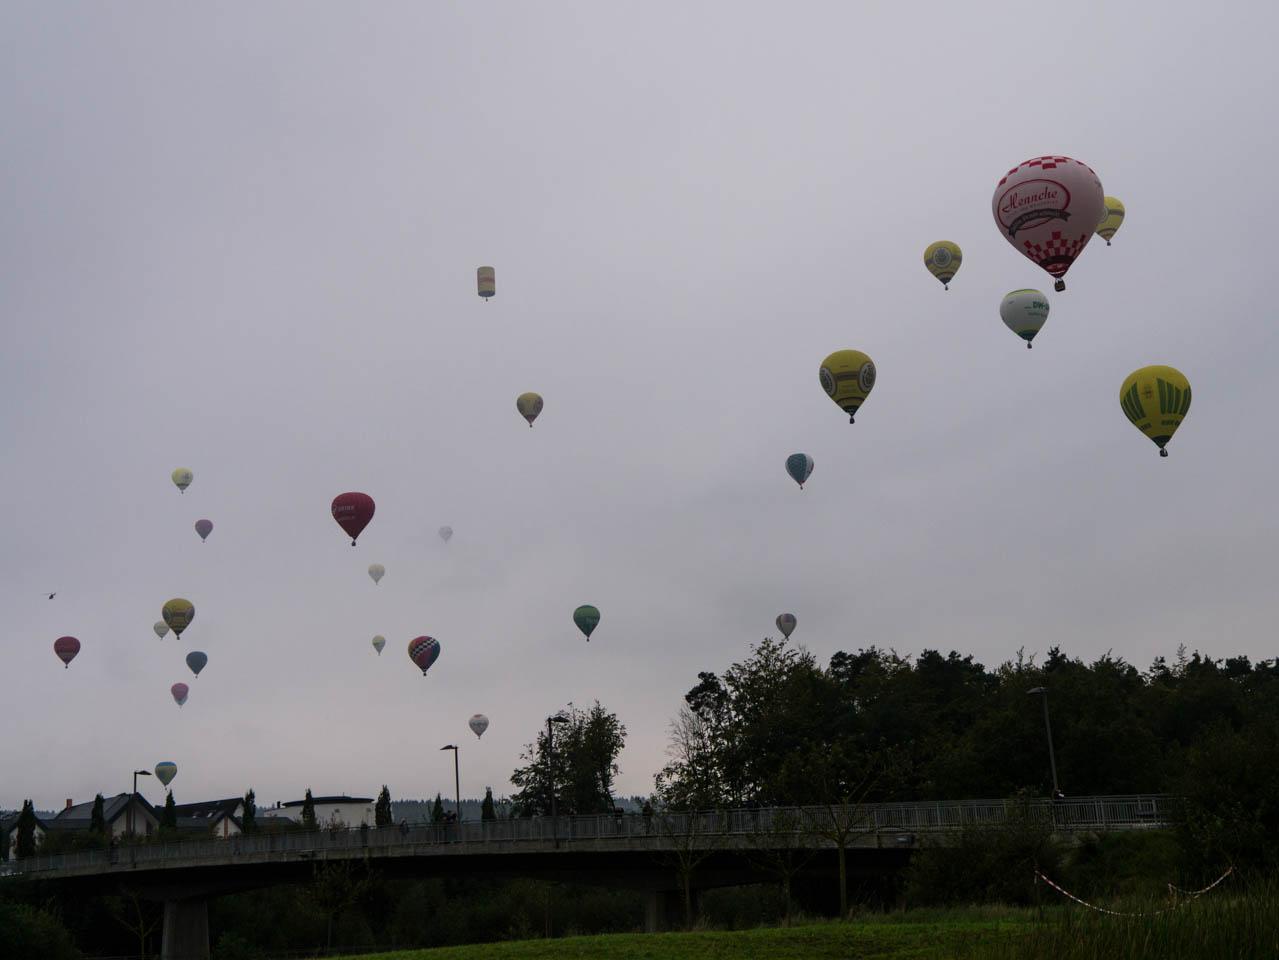 Ballone, Ballone, Ballone (1 von 1)